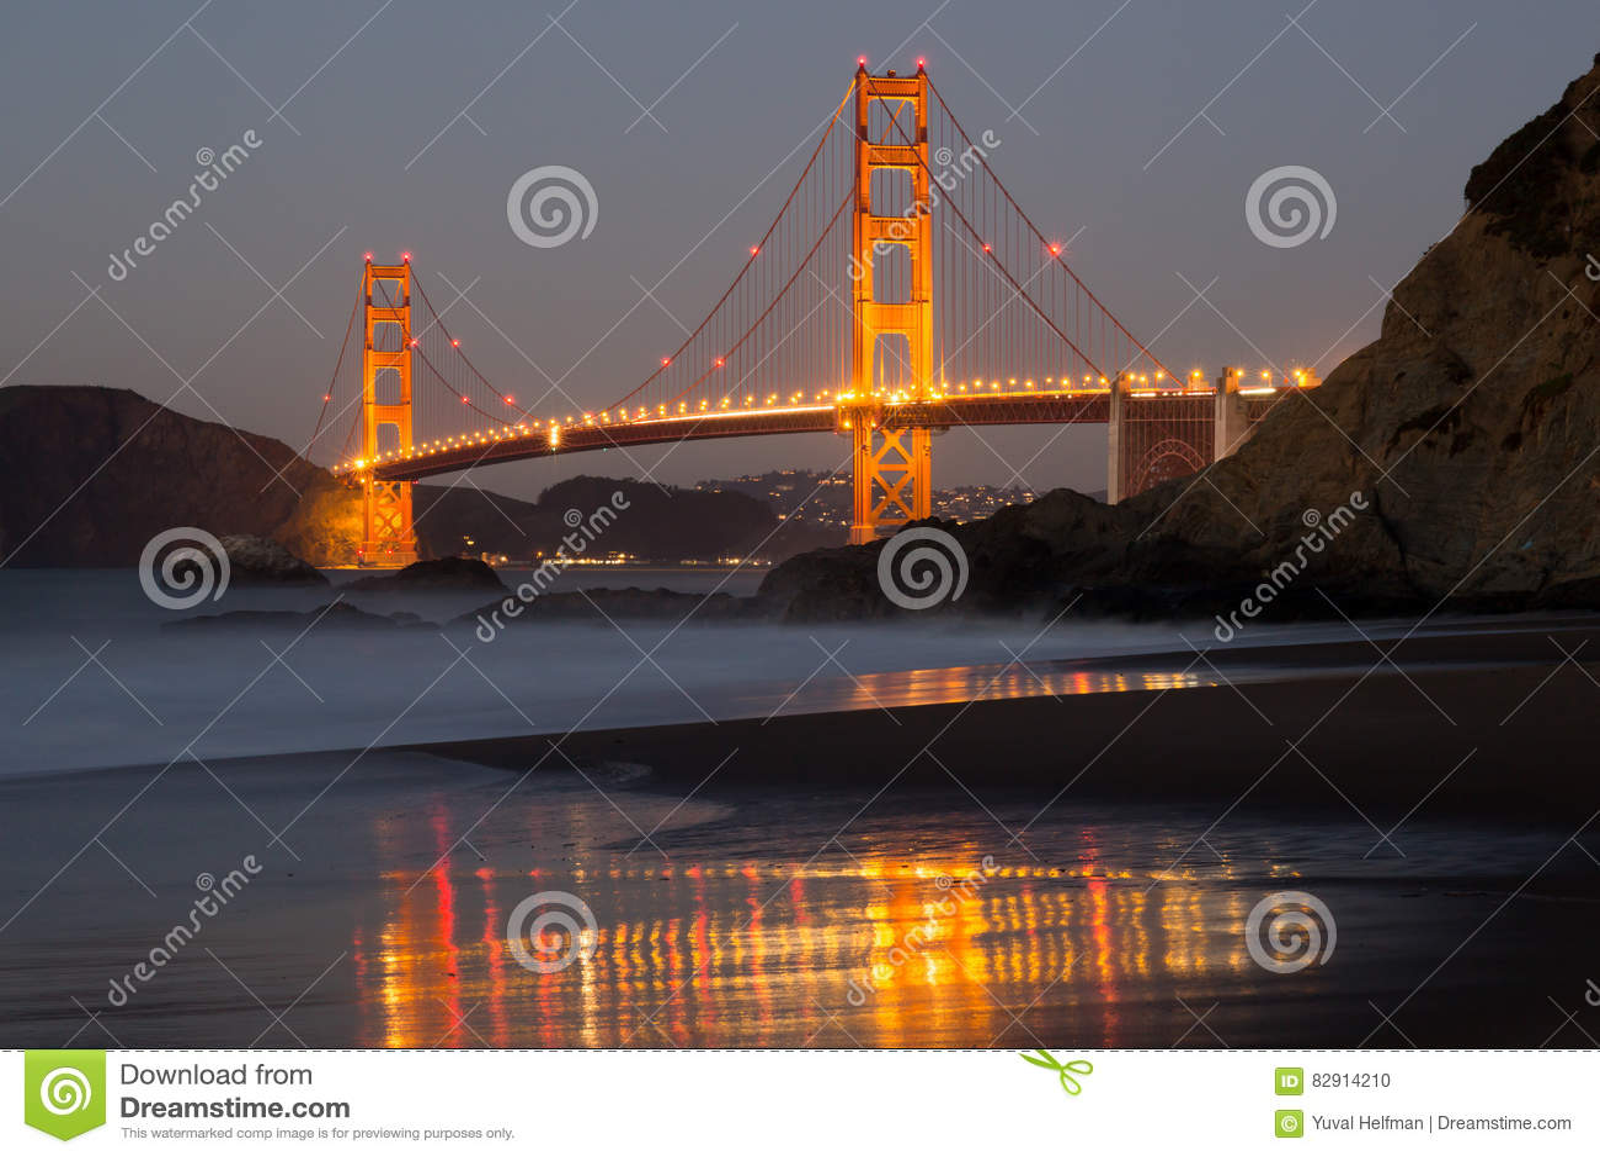 The Golden Gate Bridge and Baker Beach Reflections